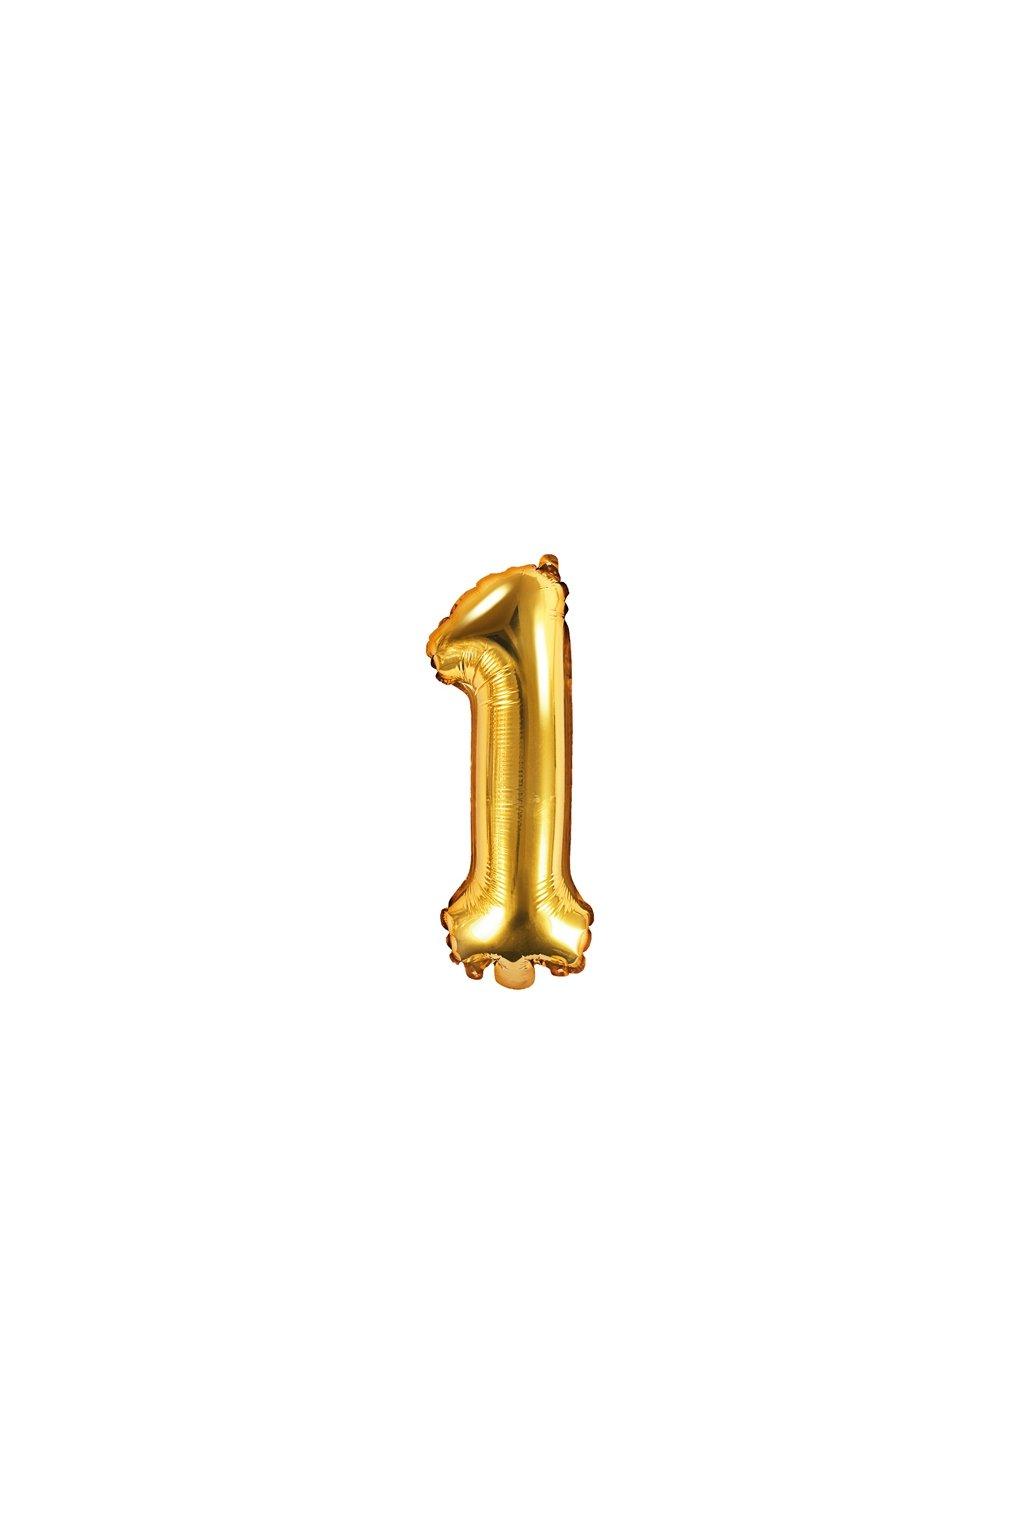 Fóliový balónek číslo 1 - zlatý 35cm